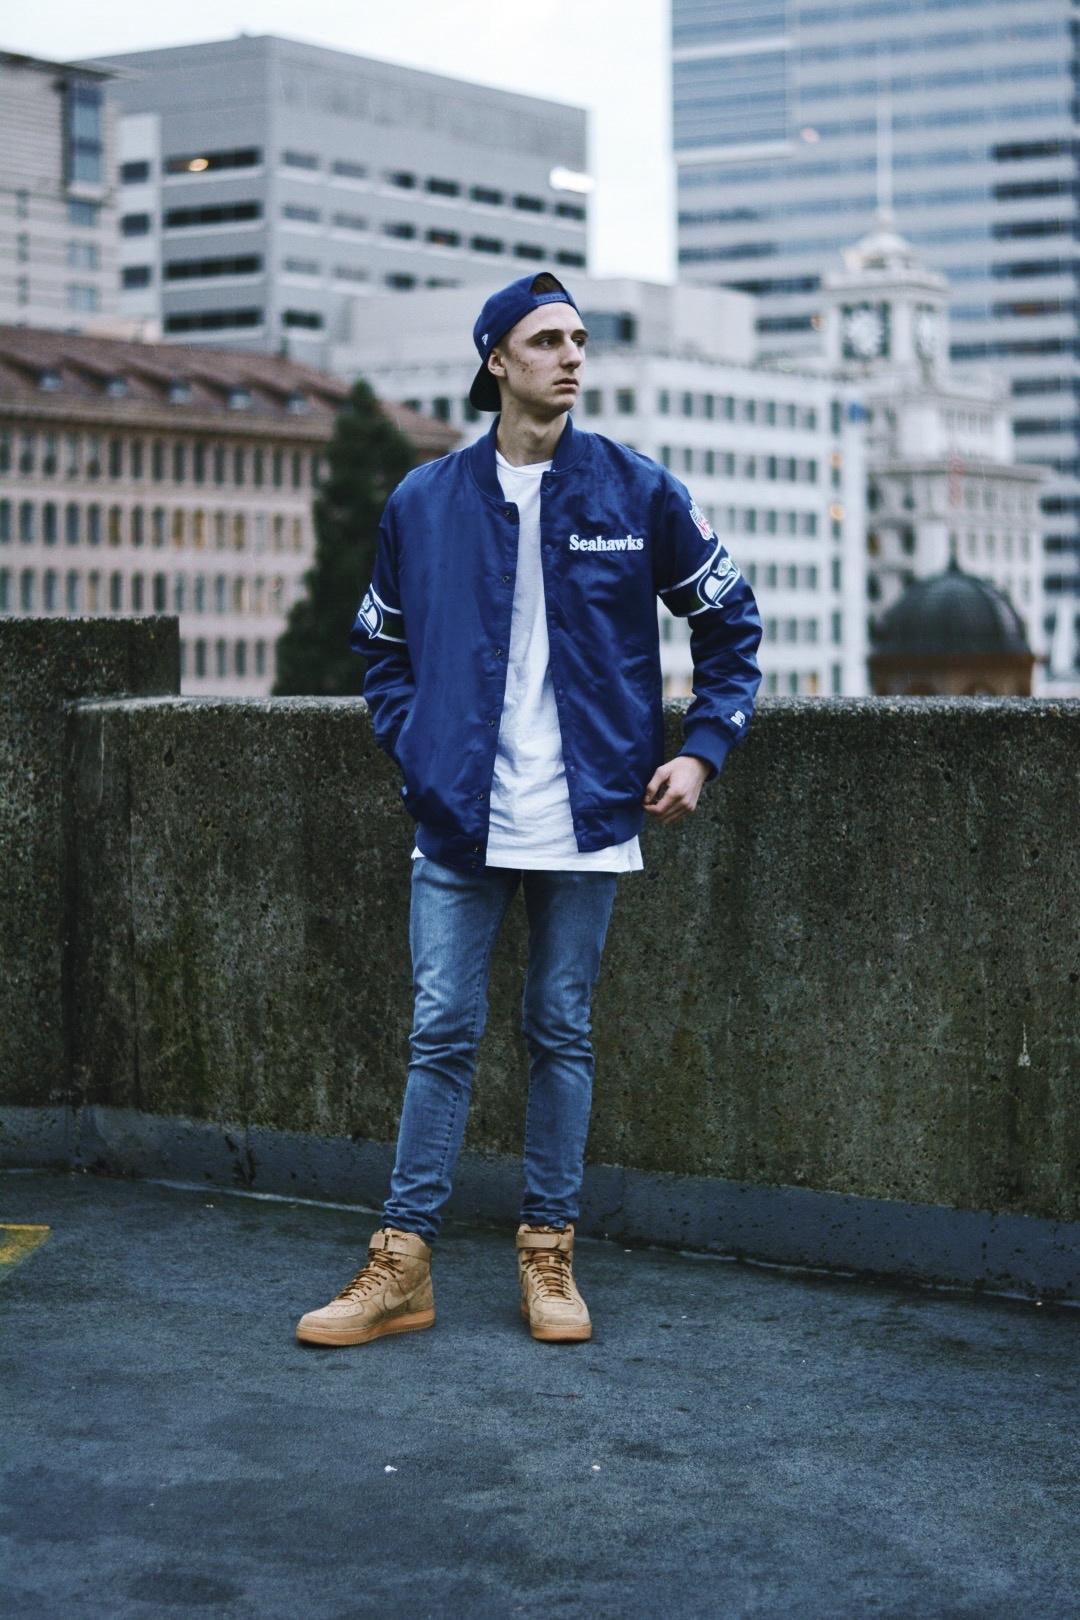 Hello I'm Daniel Valko - The blogger behind